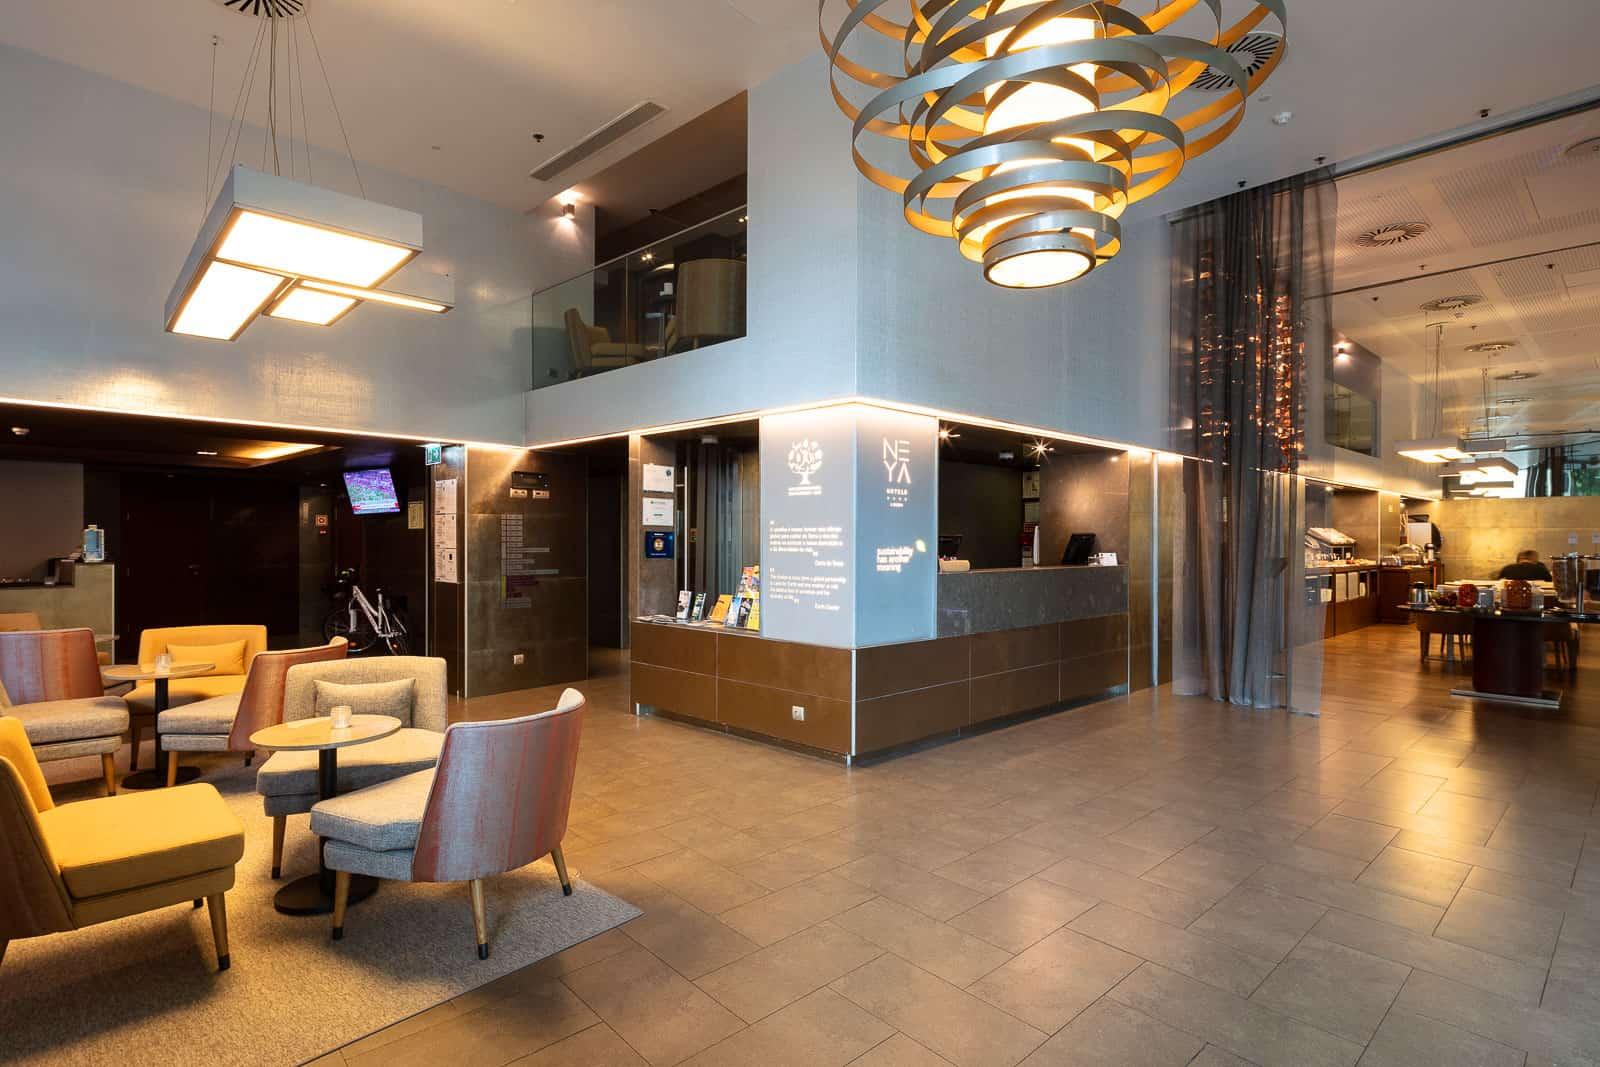 Lobby des Neya Eco Hotels in Lissabon